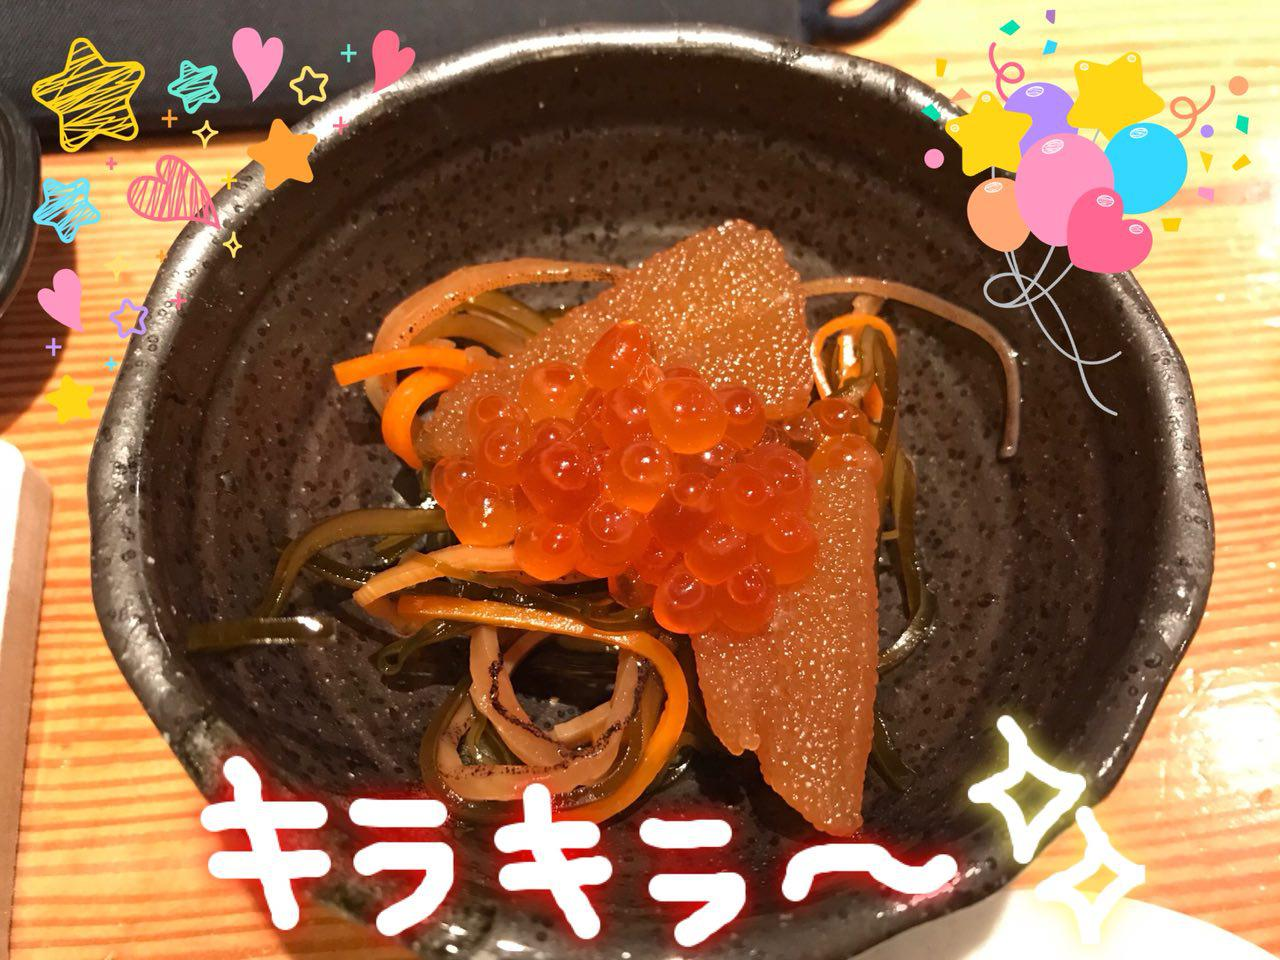 photo_2017-12-29_23-03-52.jpg